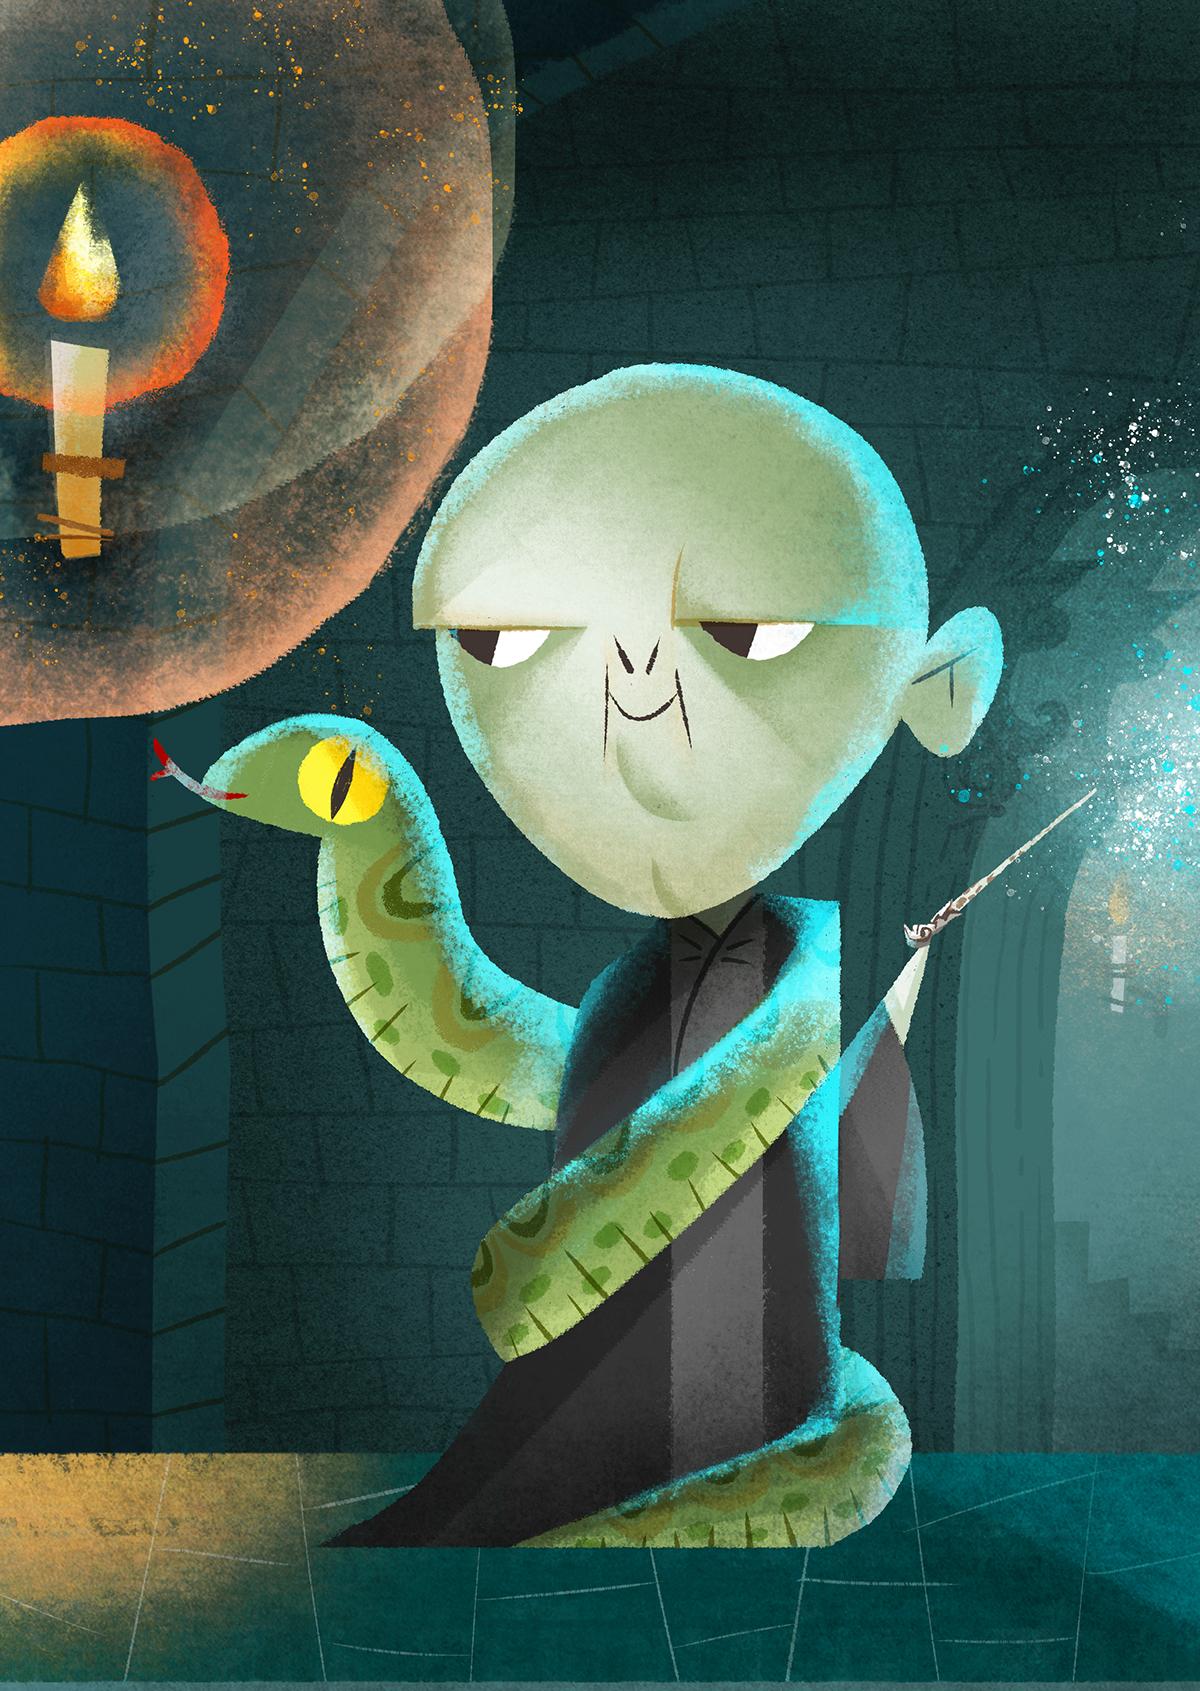 harry potter Character design  hogworts wizard Magic   voldemort jk rowling penang malaysia kuala lumpur